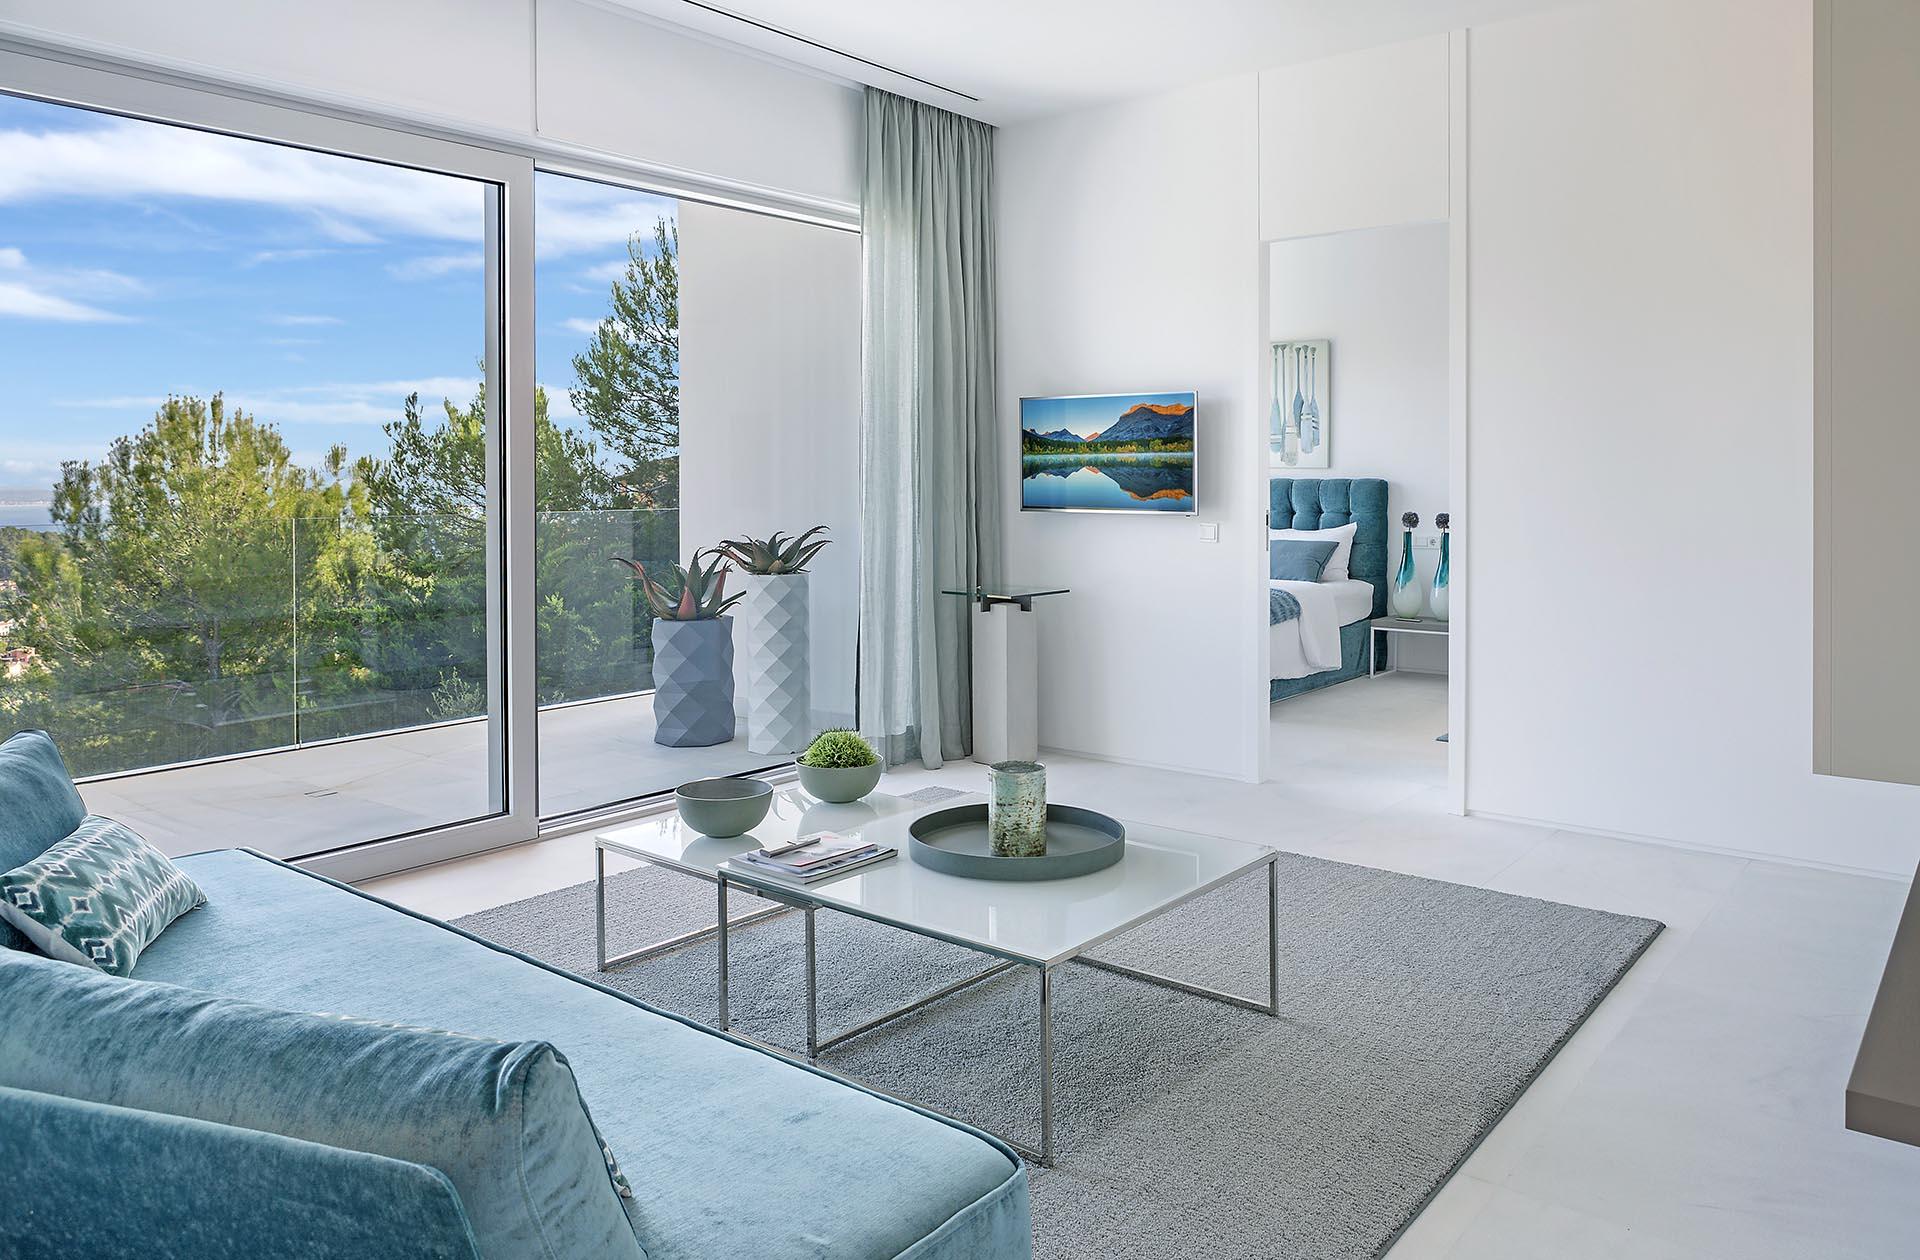 Beautiful modern villa in Costa den Blanes - High glass fronts